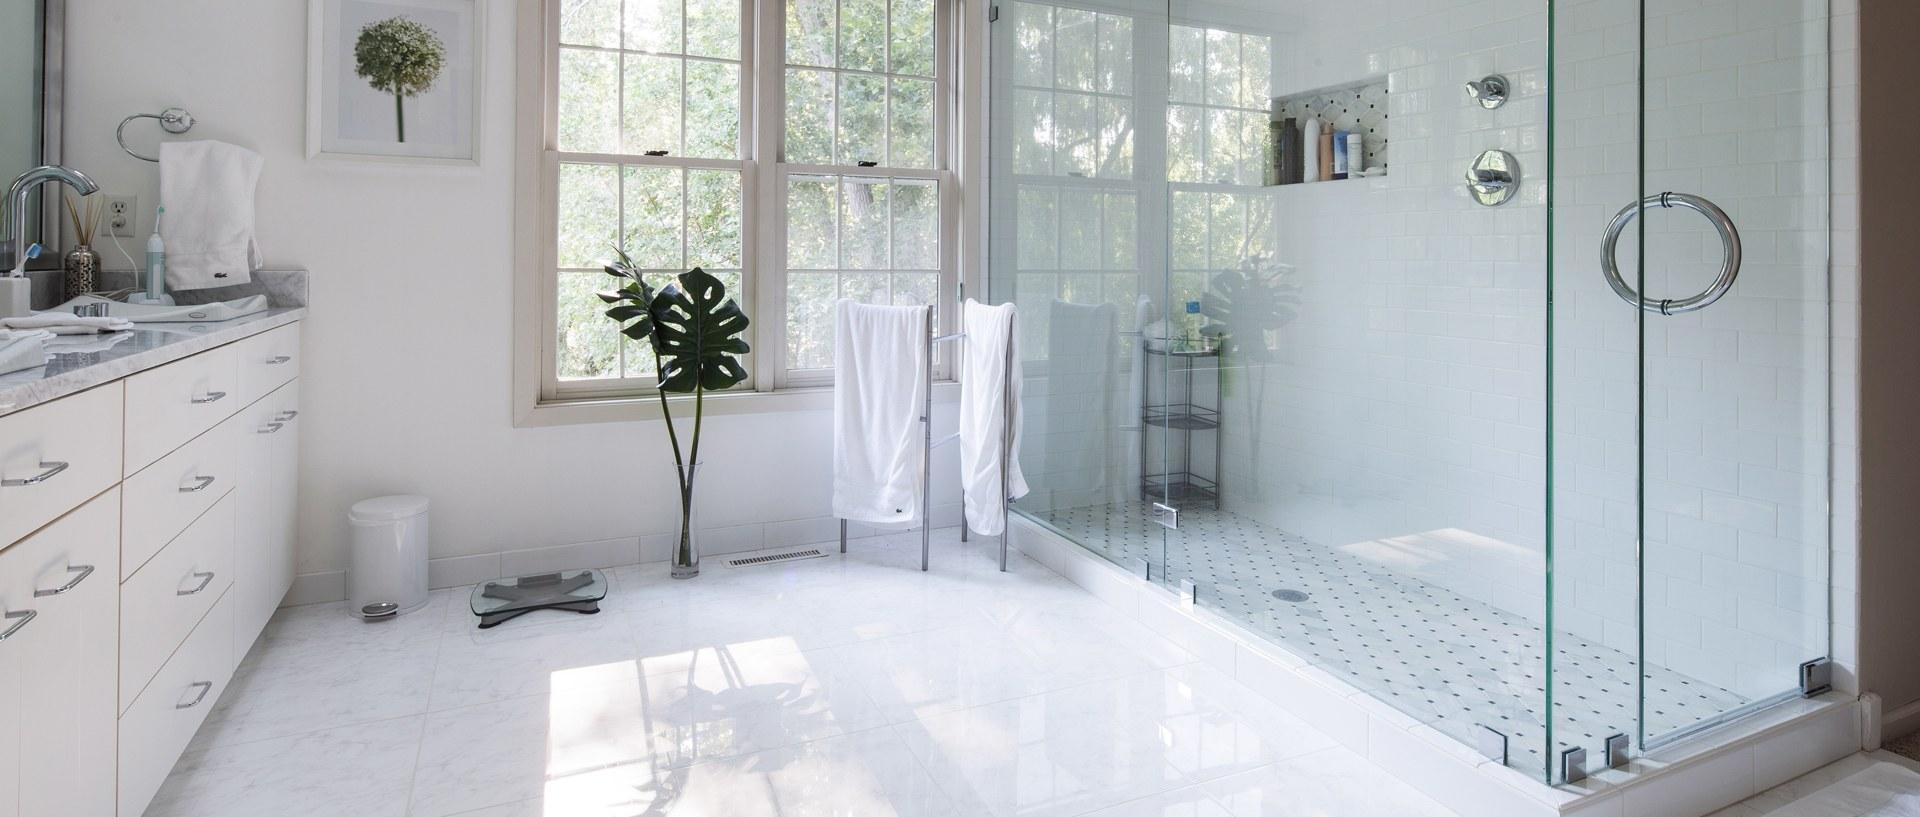 General Contractor San Jose   Kitchen Remodeling   Bathroom ...